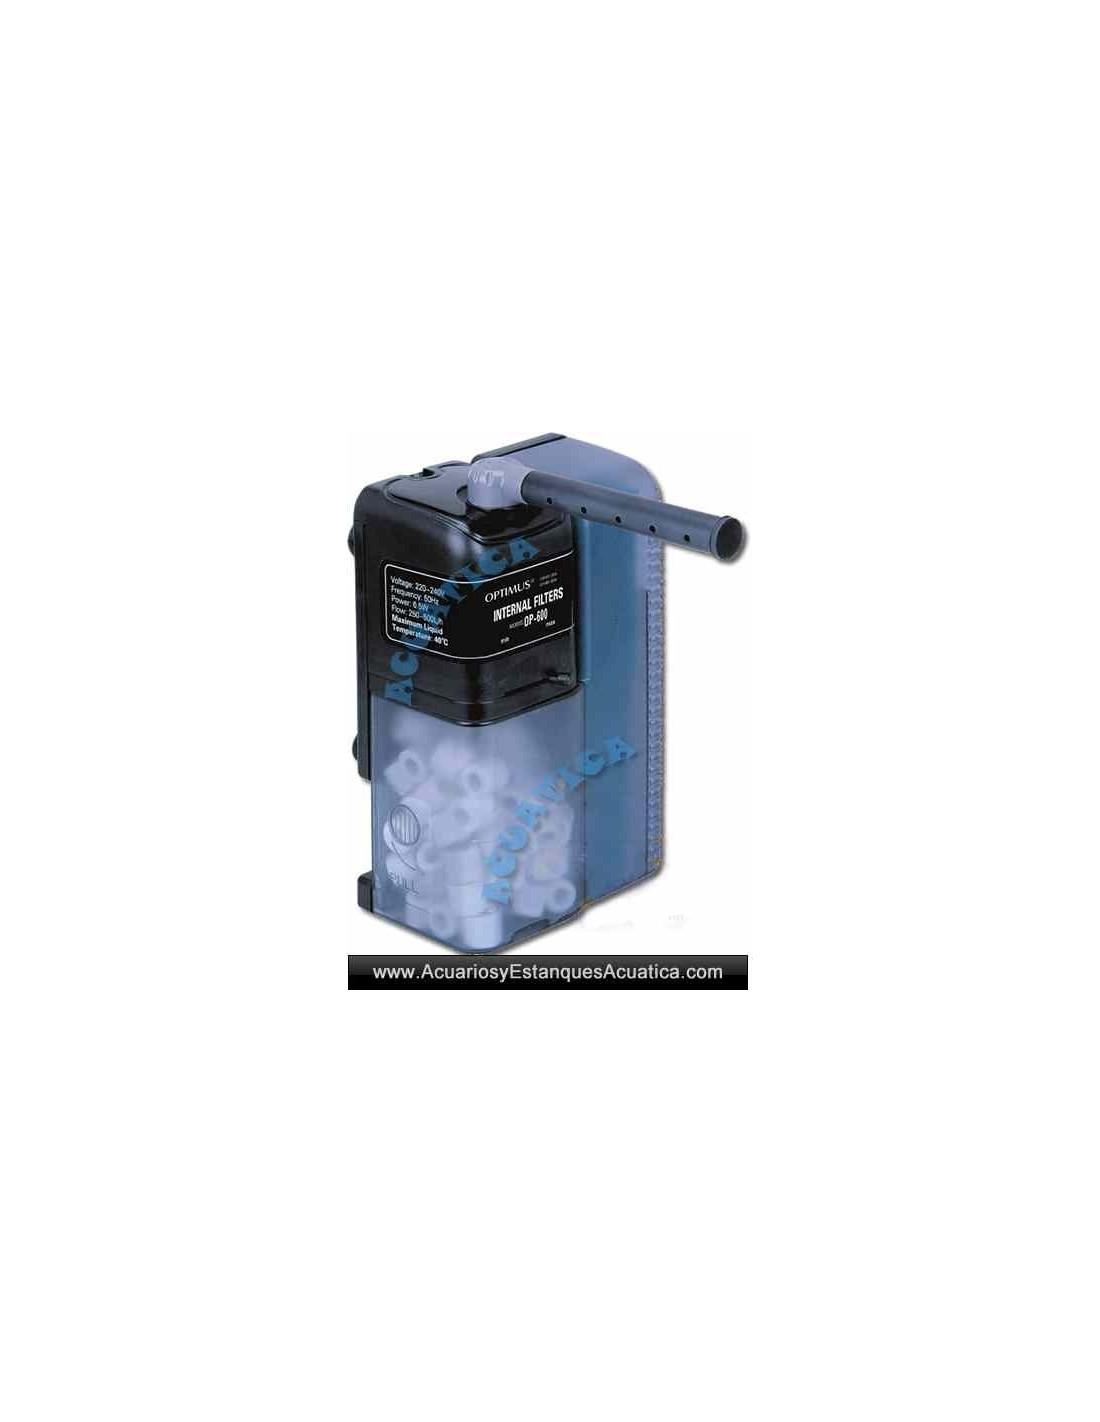 Acuario kit aqualux pro 130 for Estanque de agua 4000 litros